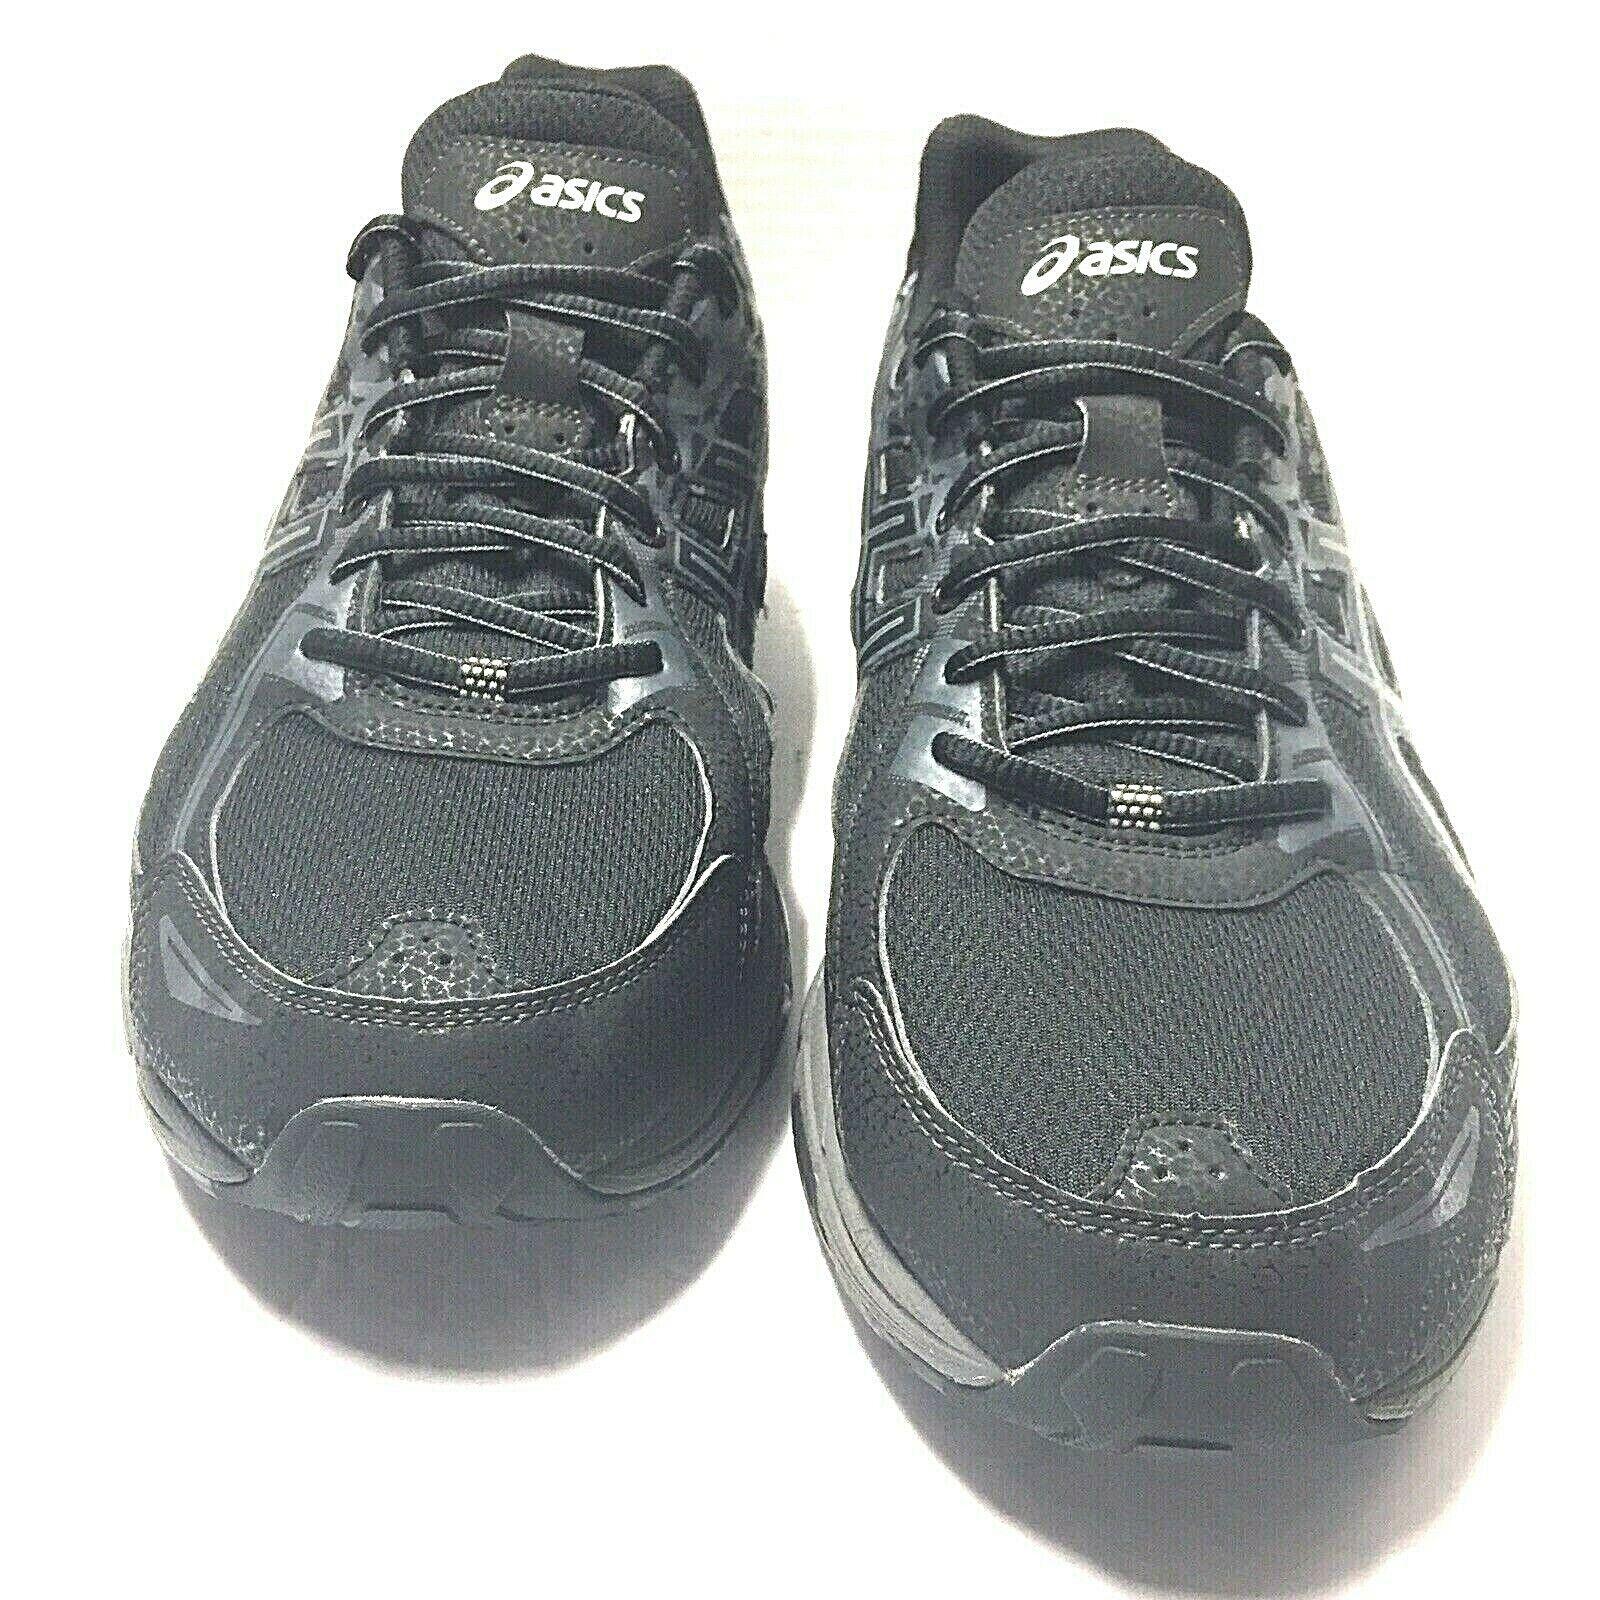 Están familiarizados Apuesta pulgar  Asics Mens Gel-Venture 6 T7G1N Running Walking Shoes Black Gray Size 14 Us  for sale online